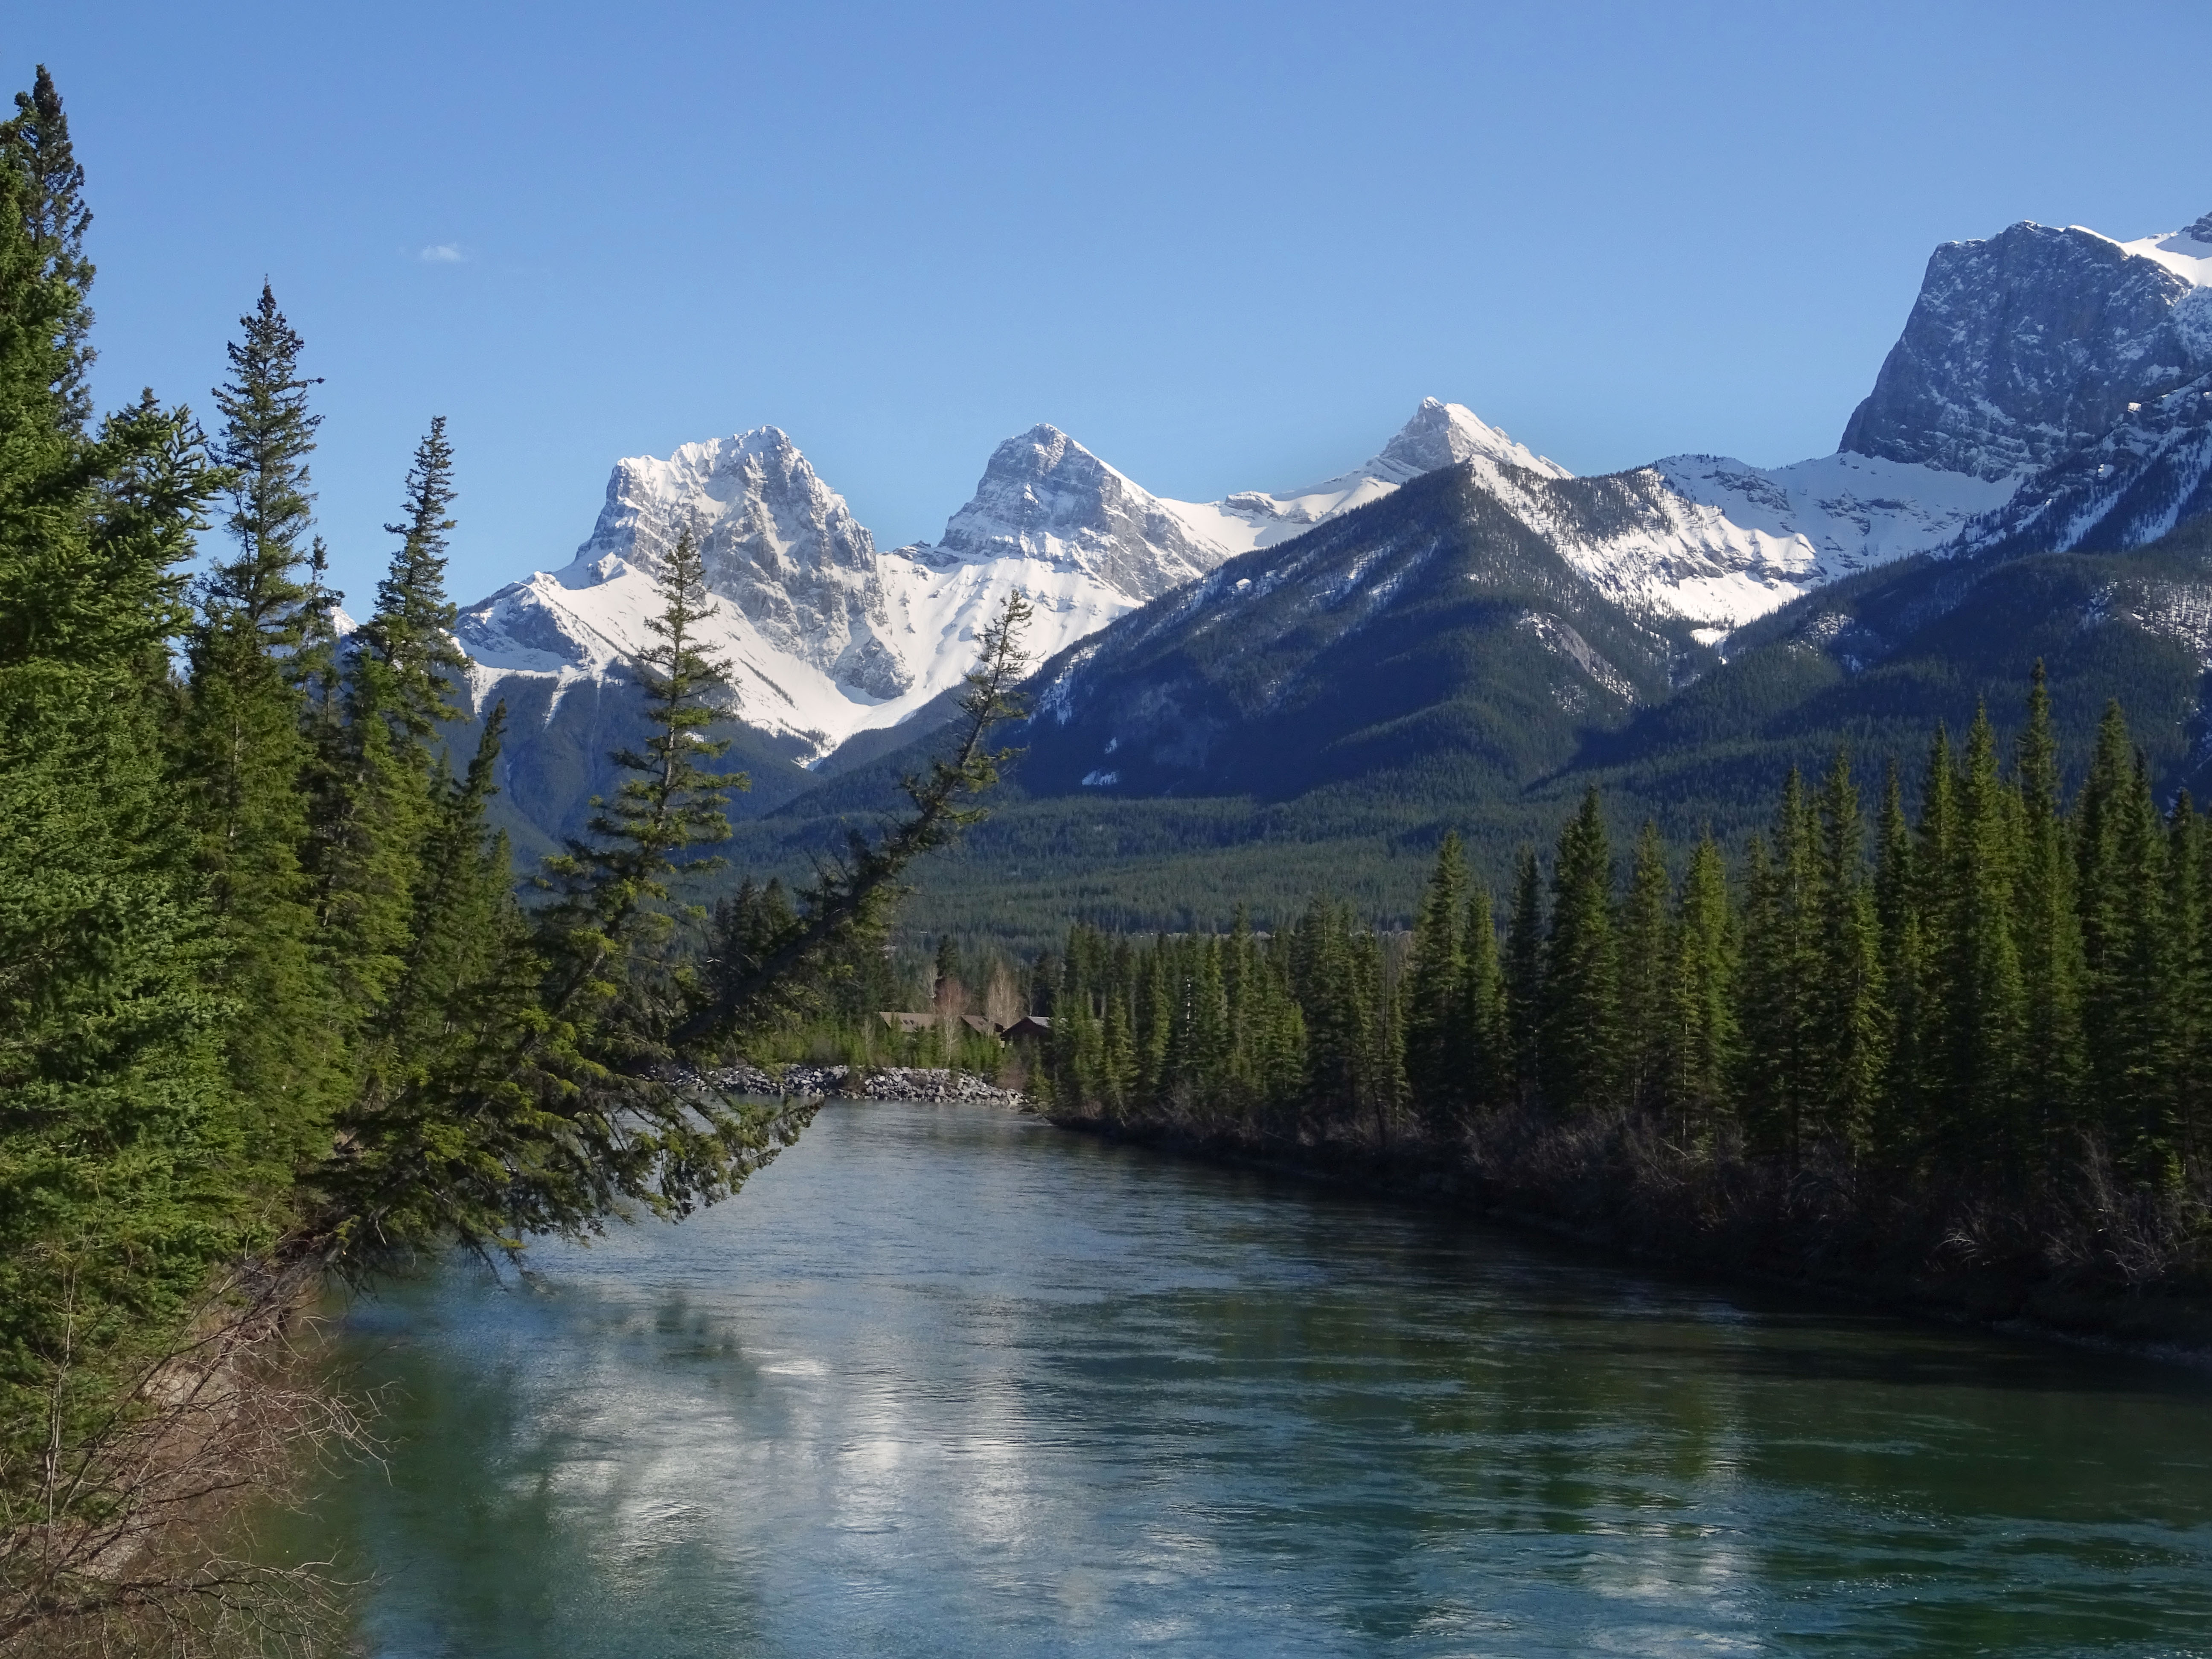 Canmore, Village au coeur des Rocheuses Canadiennes, Alberta